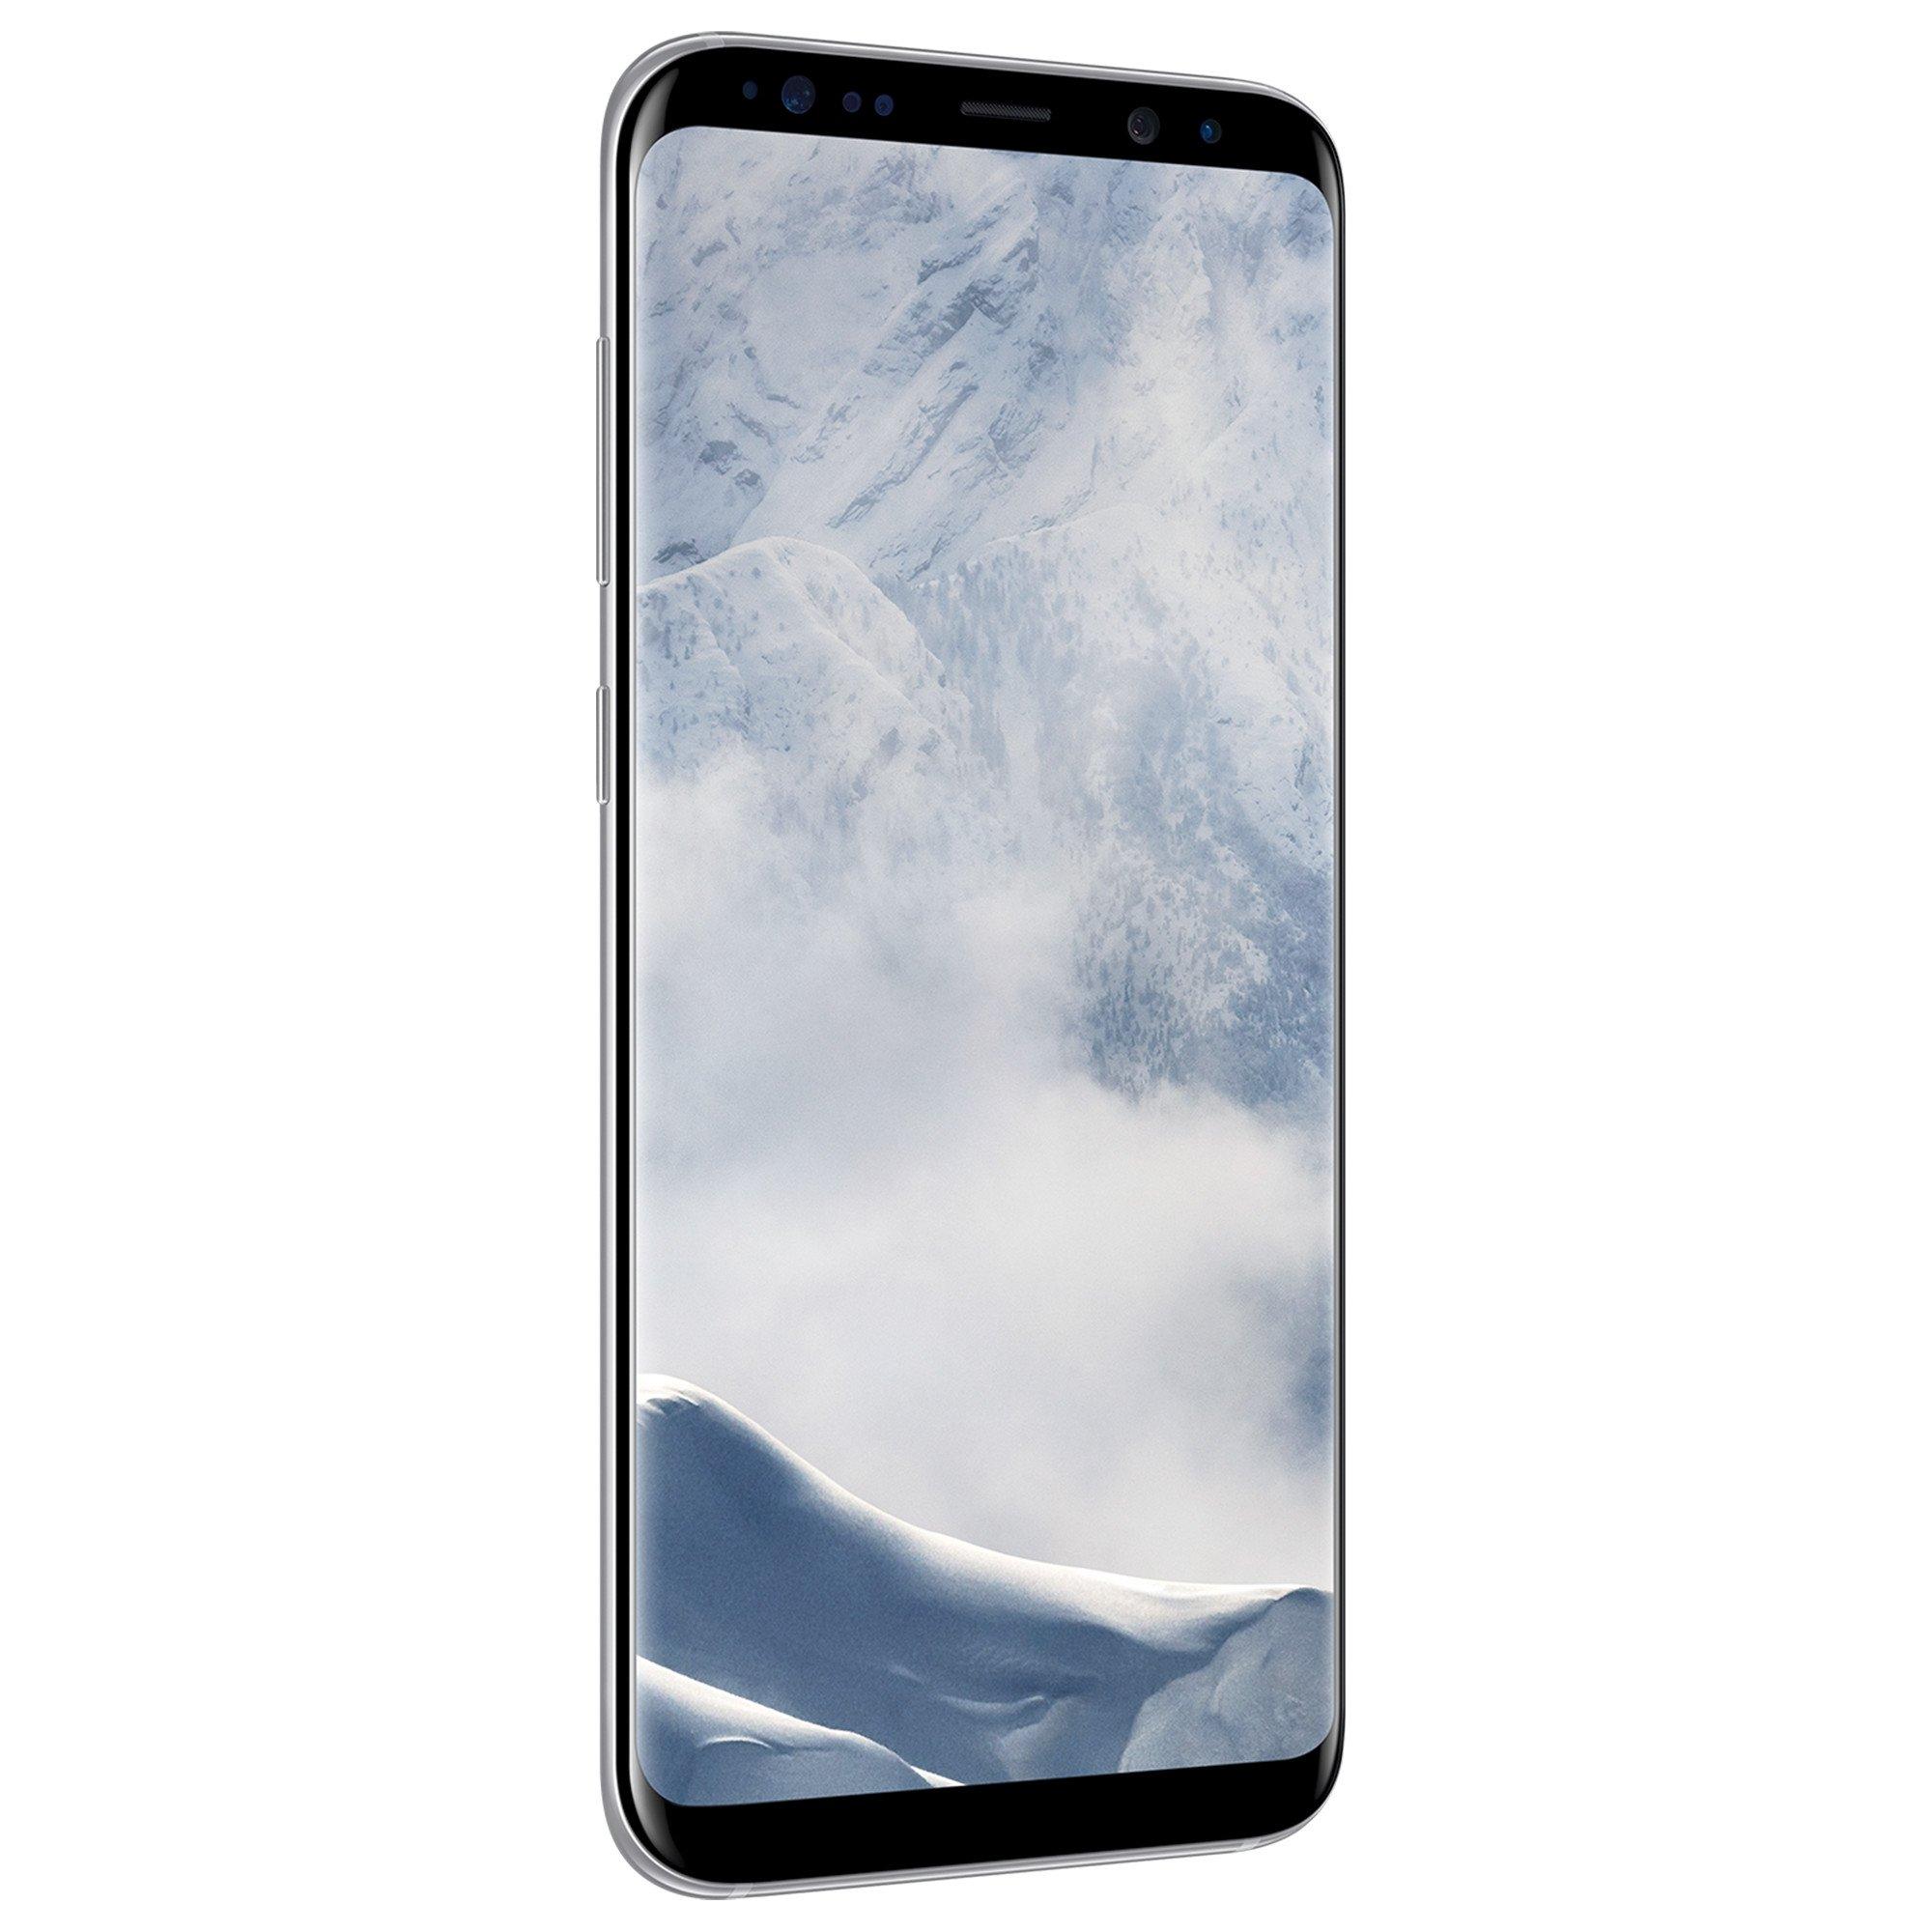 Samsung Galaxy S8 Plus - Smartphone libre (6.2, 4GB RAM, 64GB ...